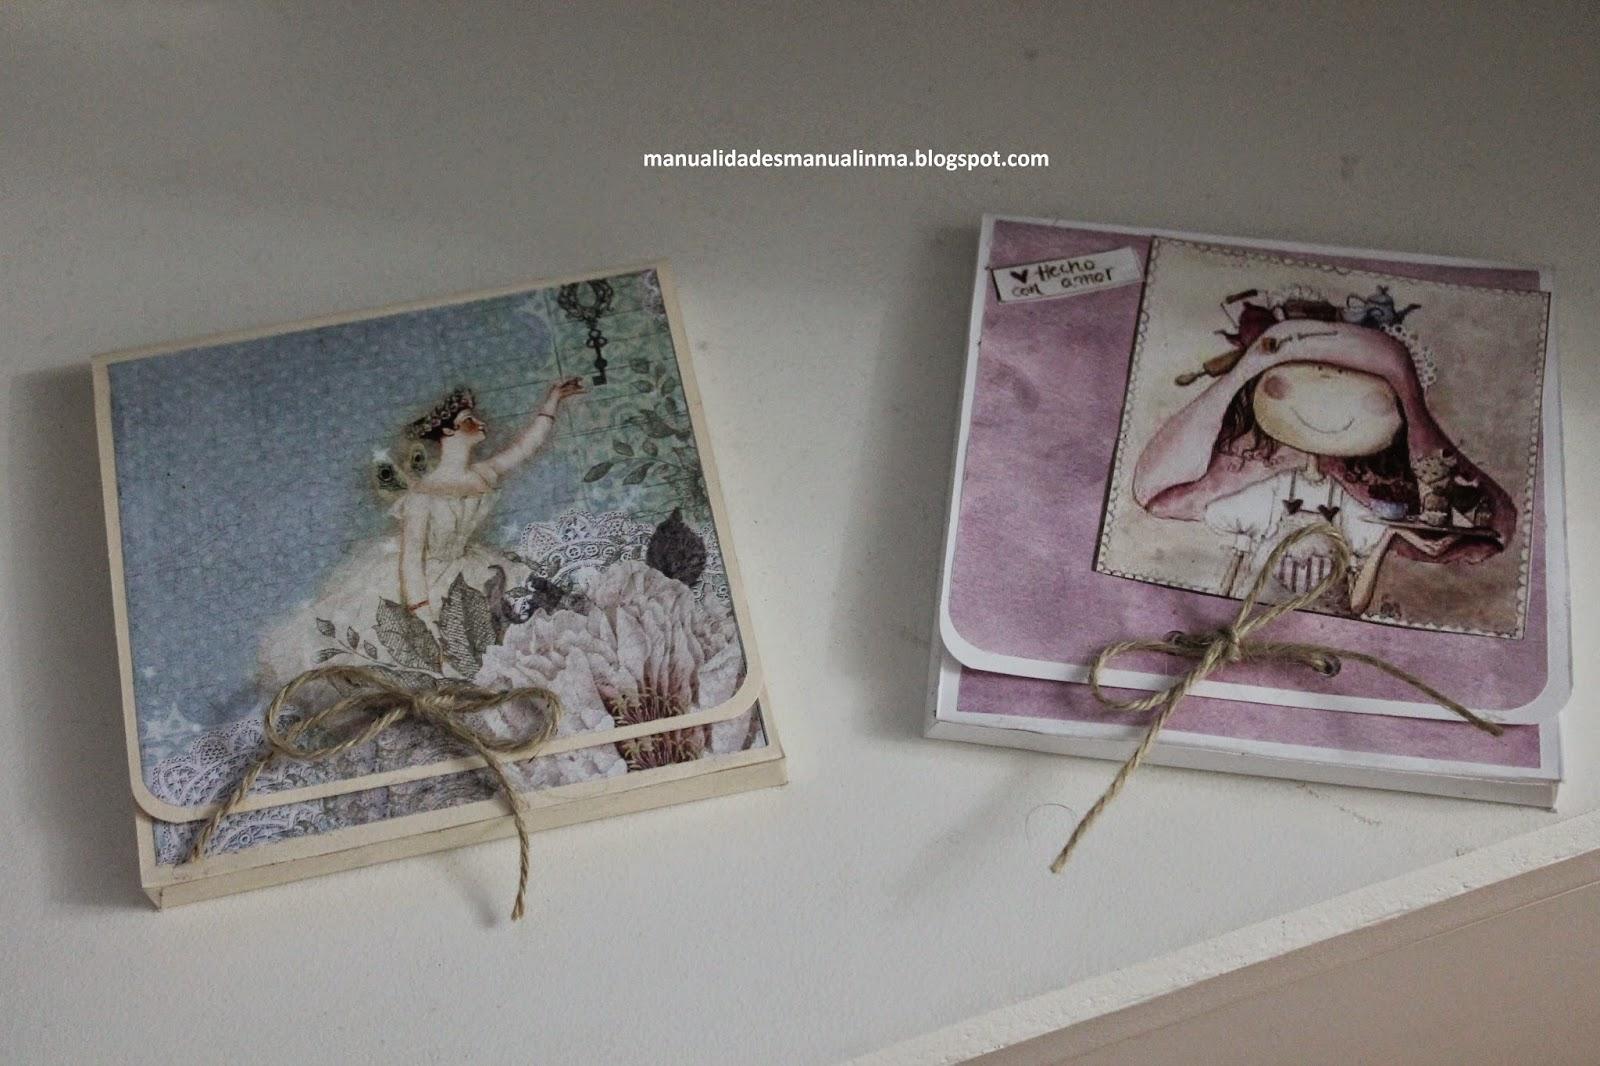 Manualinma cajas para guardar los cd o dvd - Para guardar cds ...